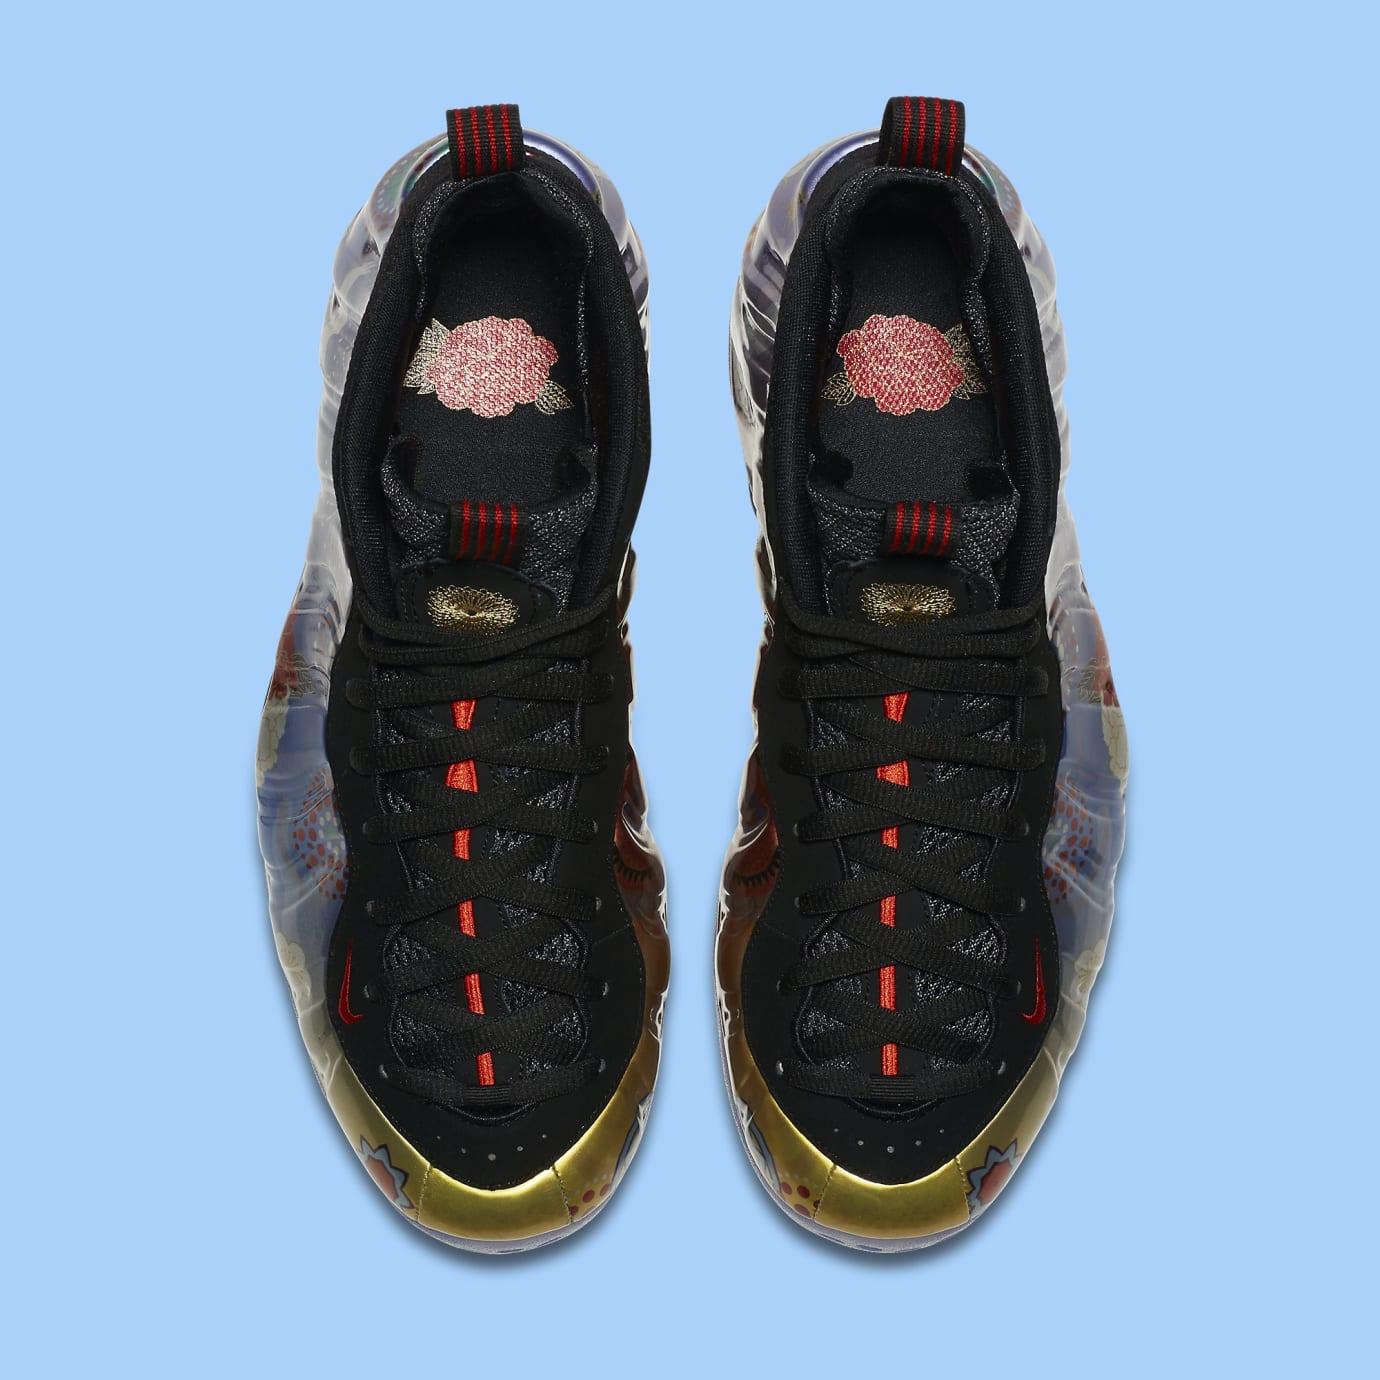 50708319bde2 Image via Nike Nike Air Foamposite One  Chinese New Year  AO7541-006 (Top)